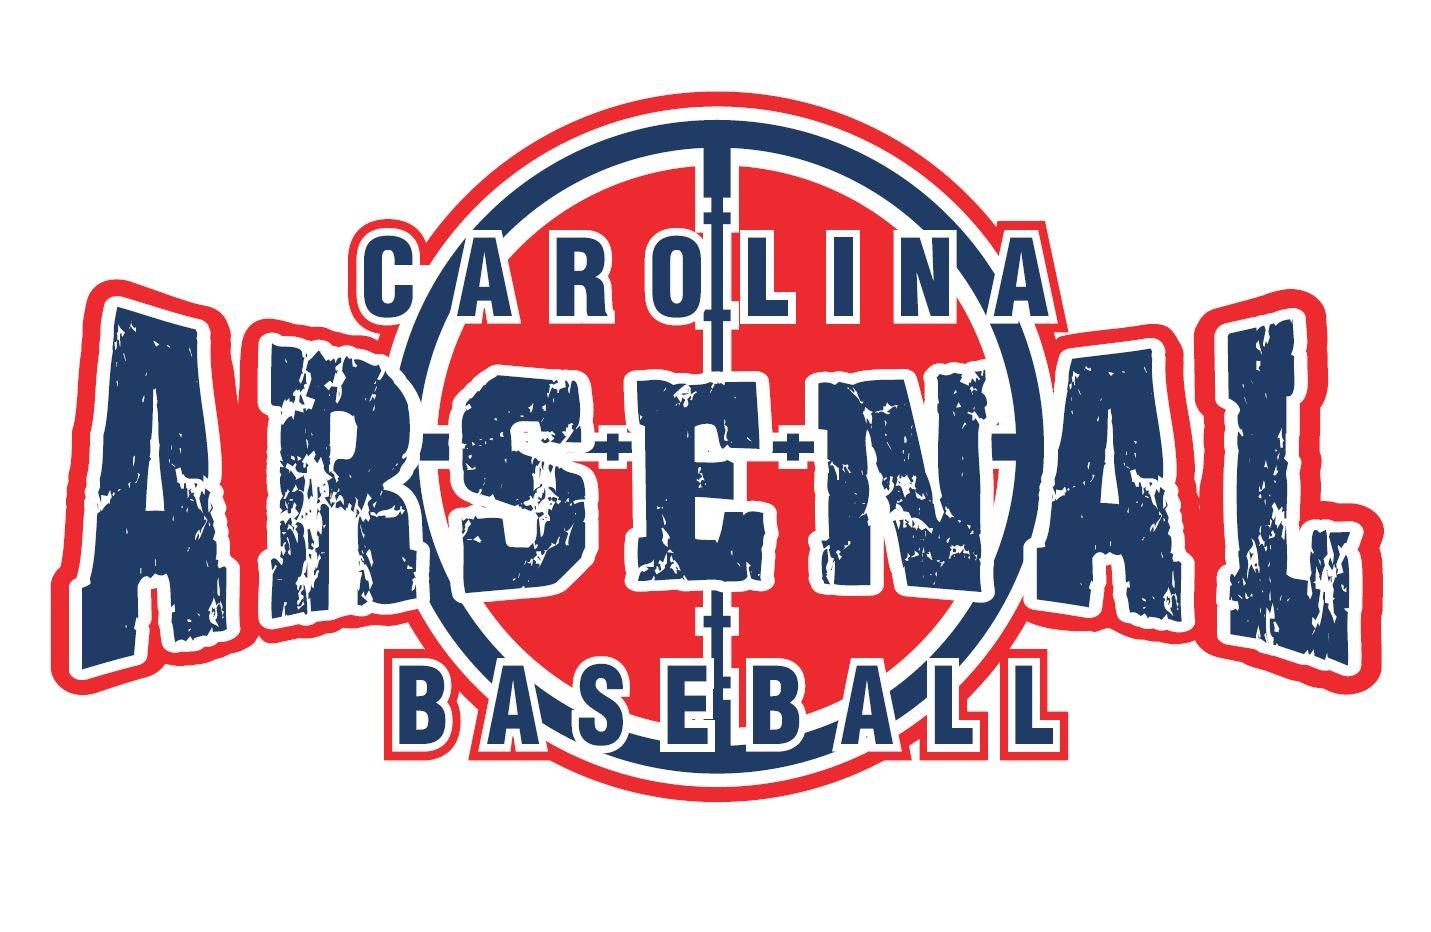 Carolina Arsenal 12U Baseball Cooperstown Fundraiser